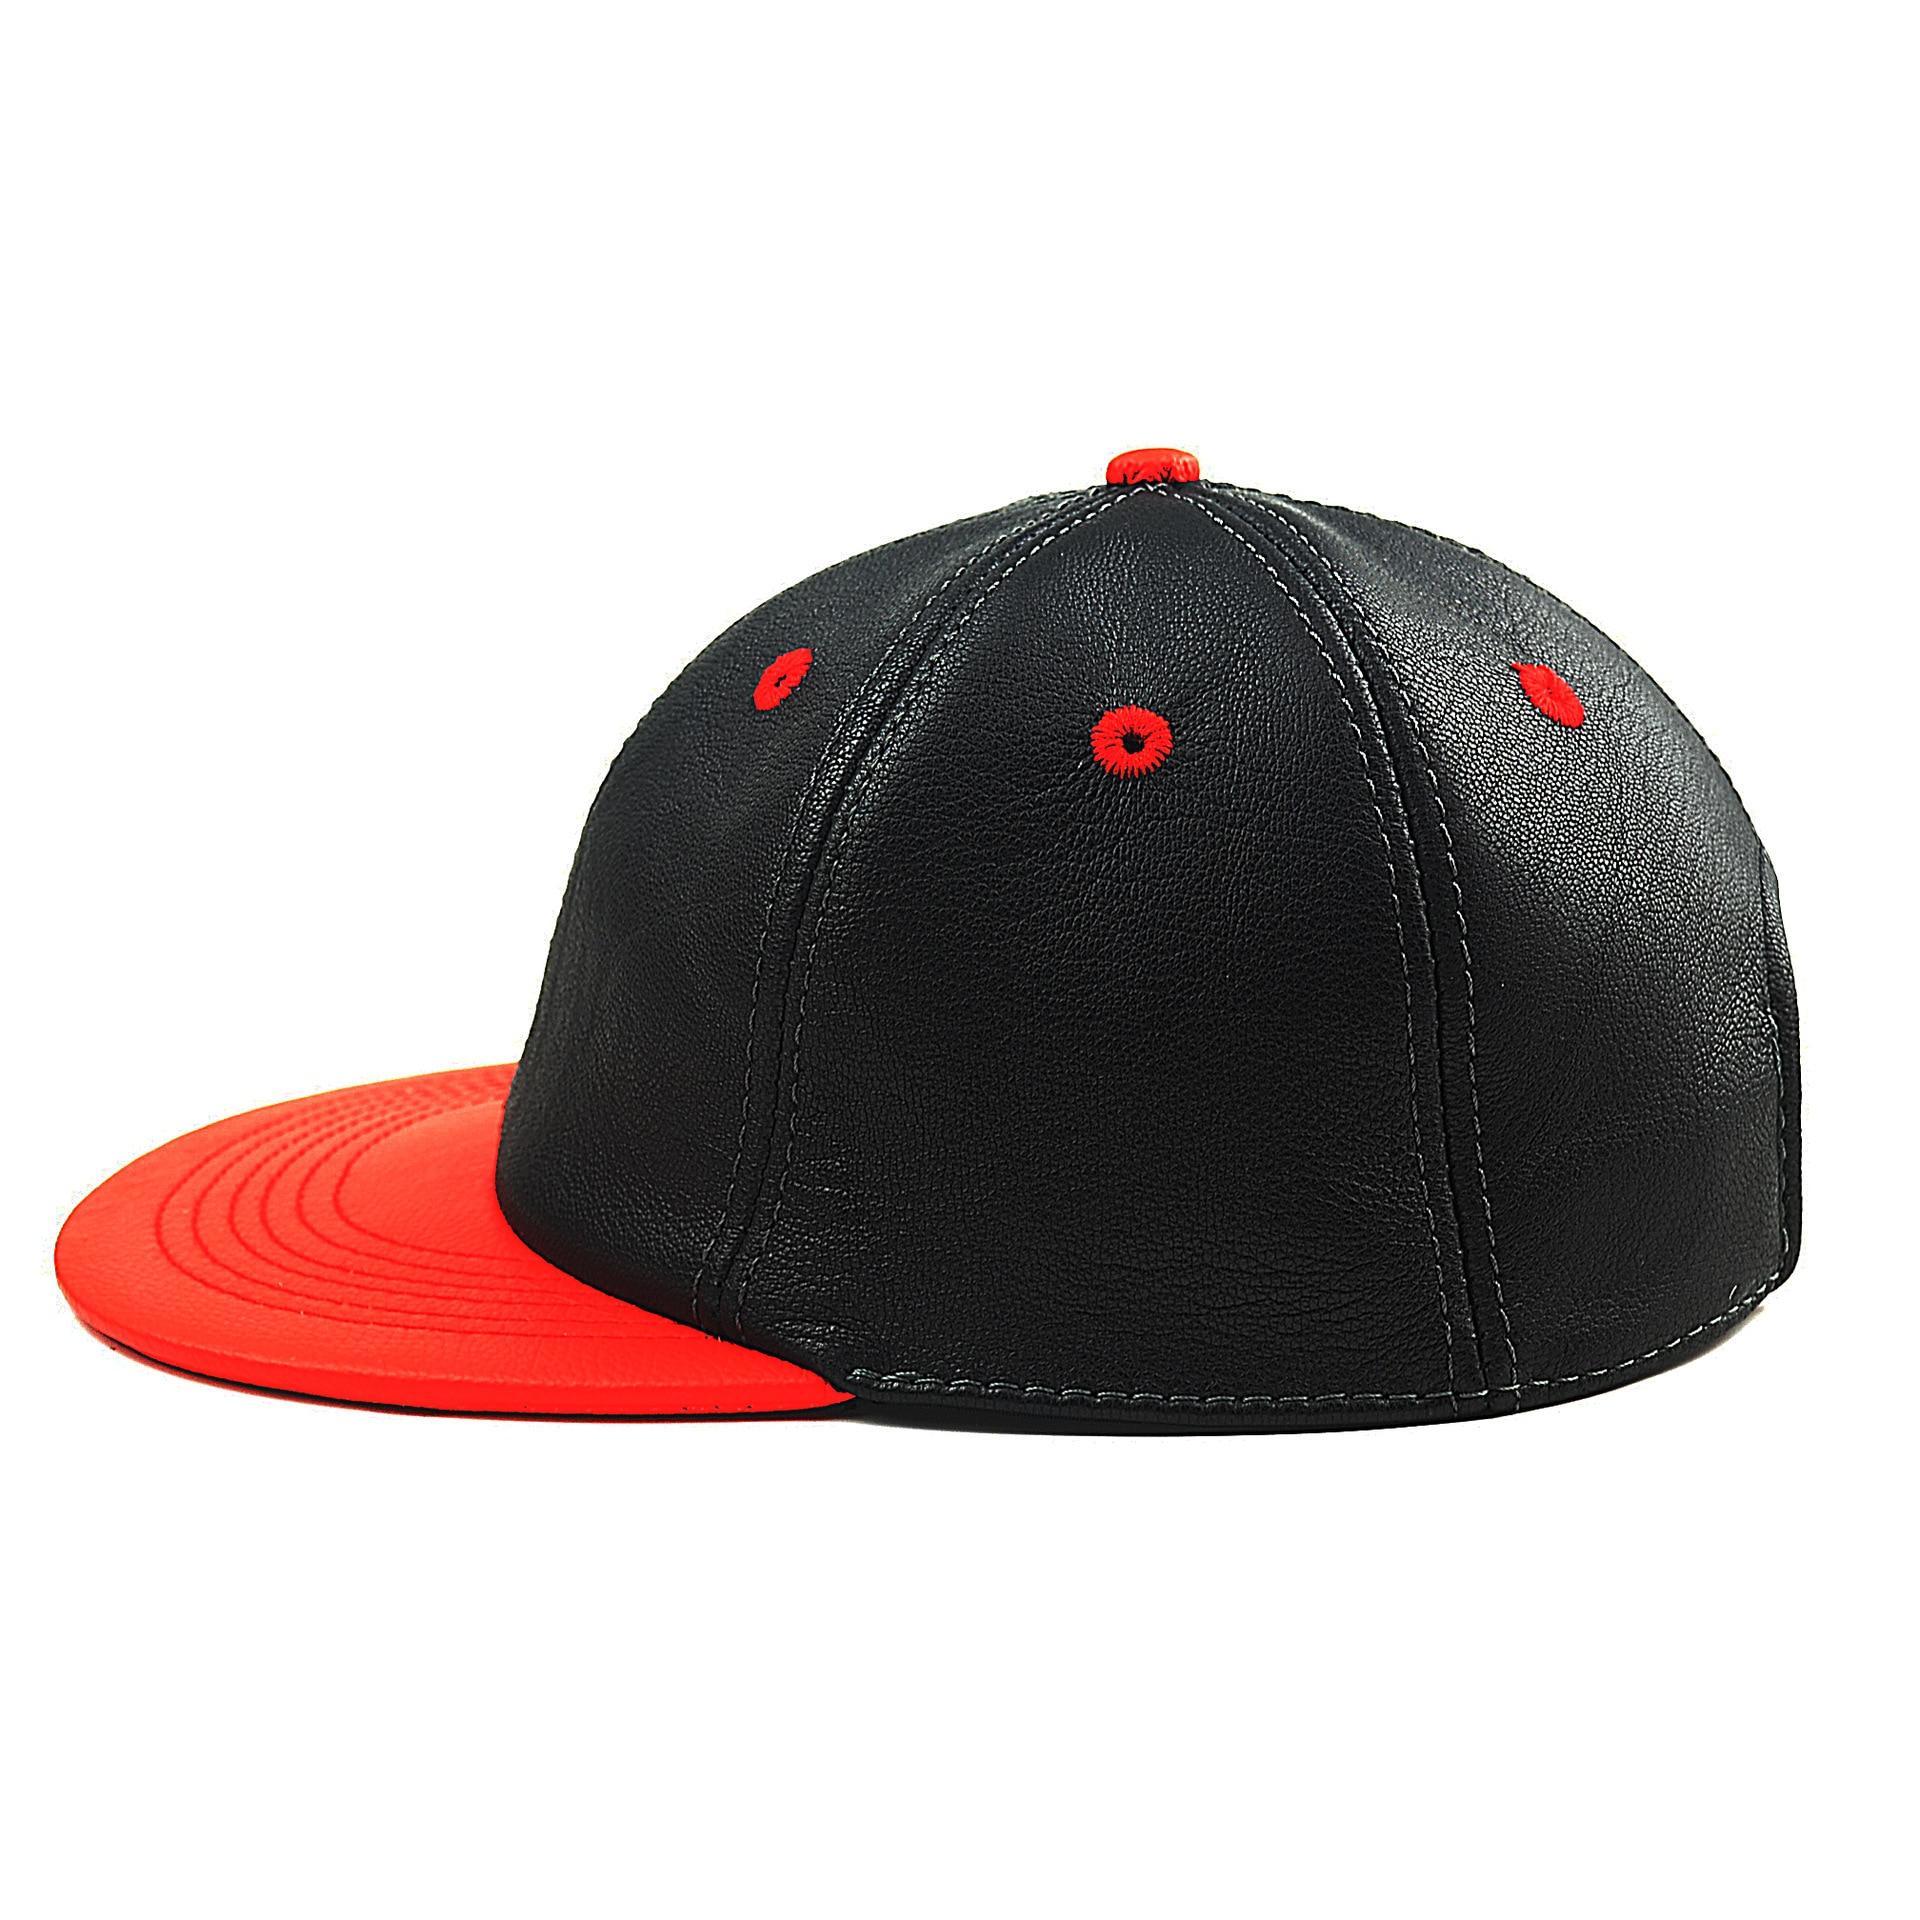 Winter fashion sheepskin hip-hop cap Men's and women's baseball cap Leather hat